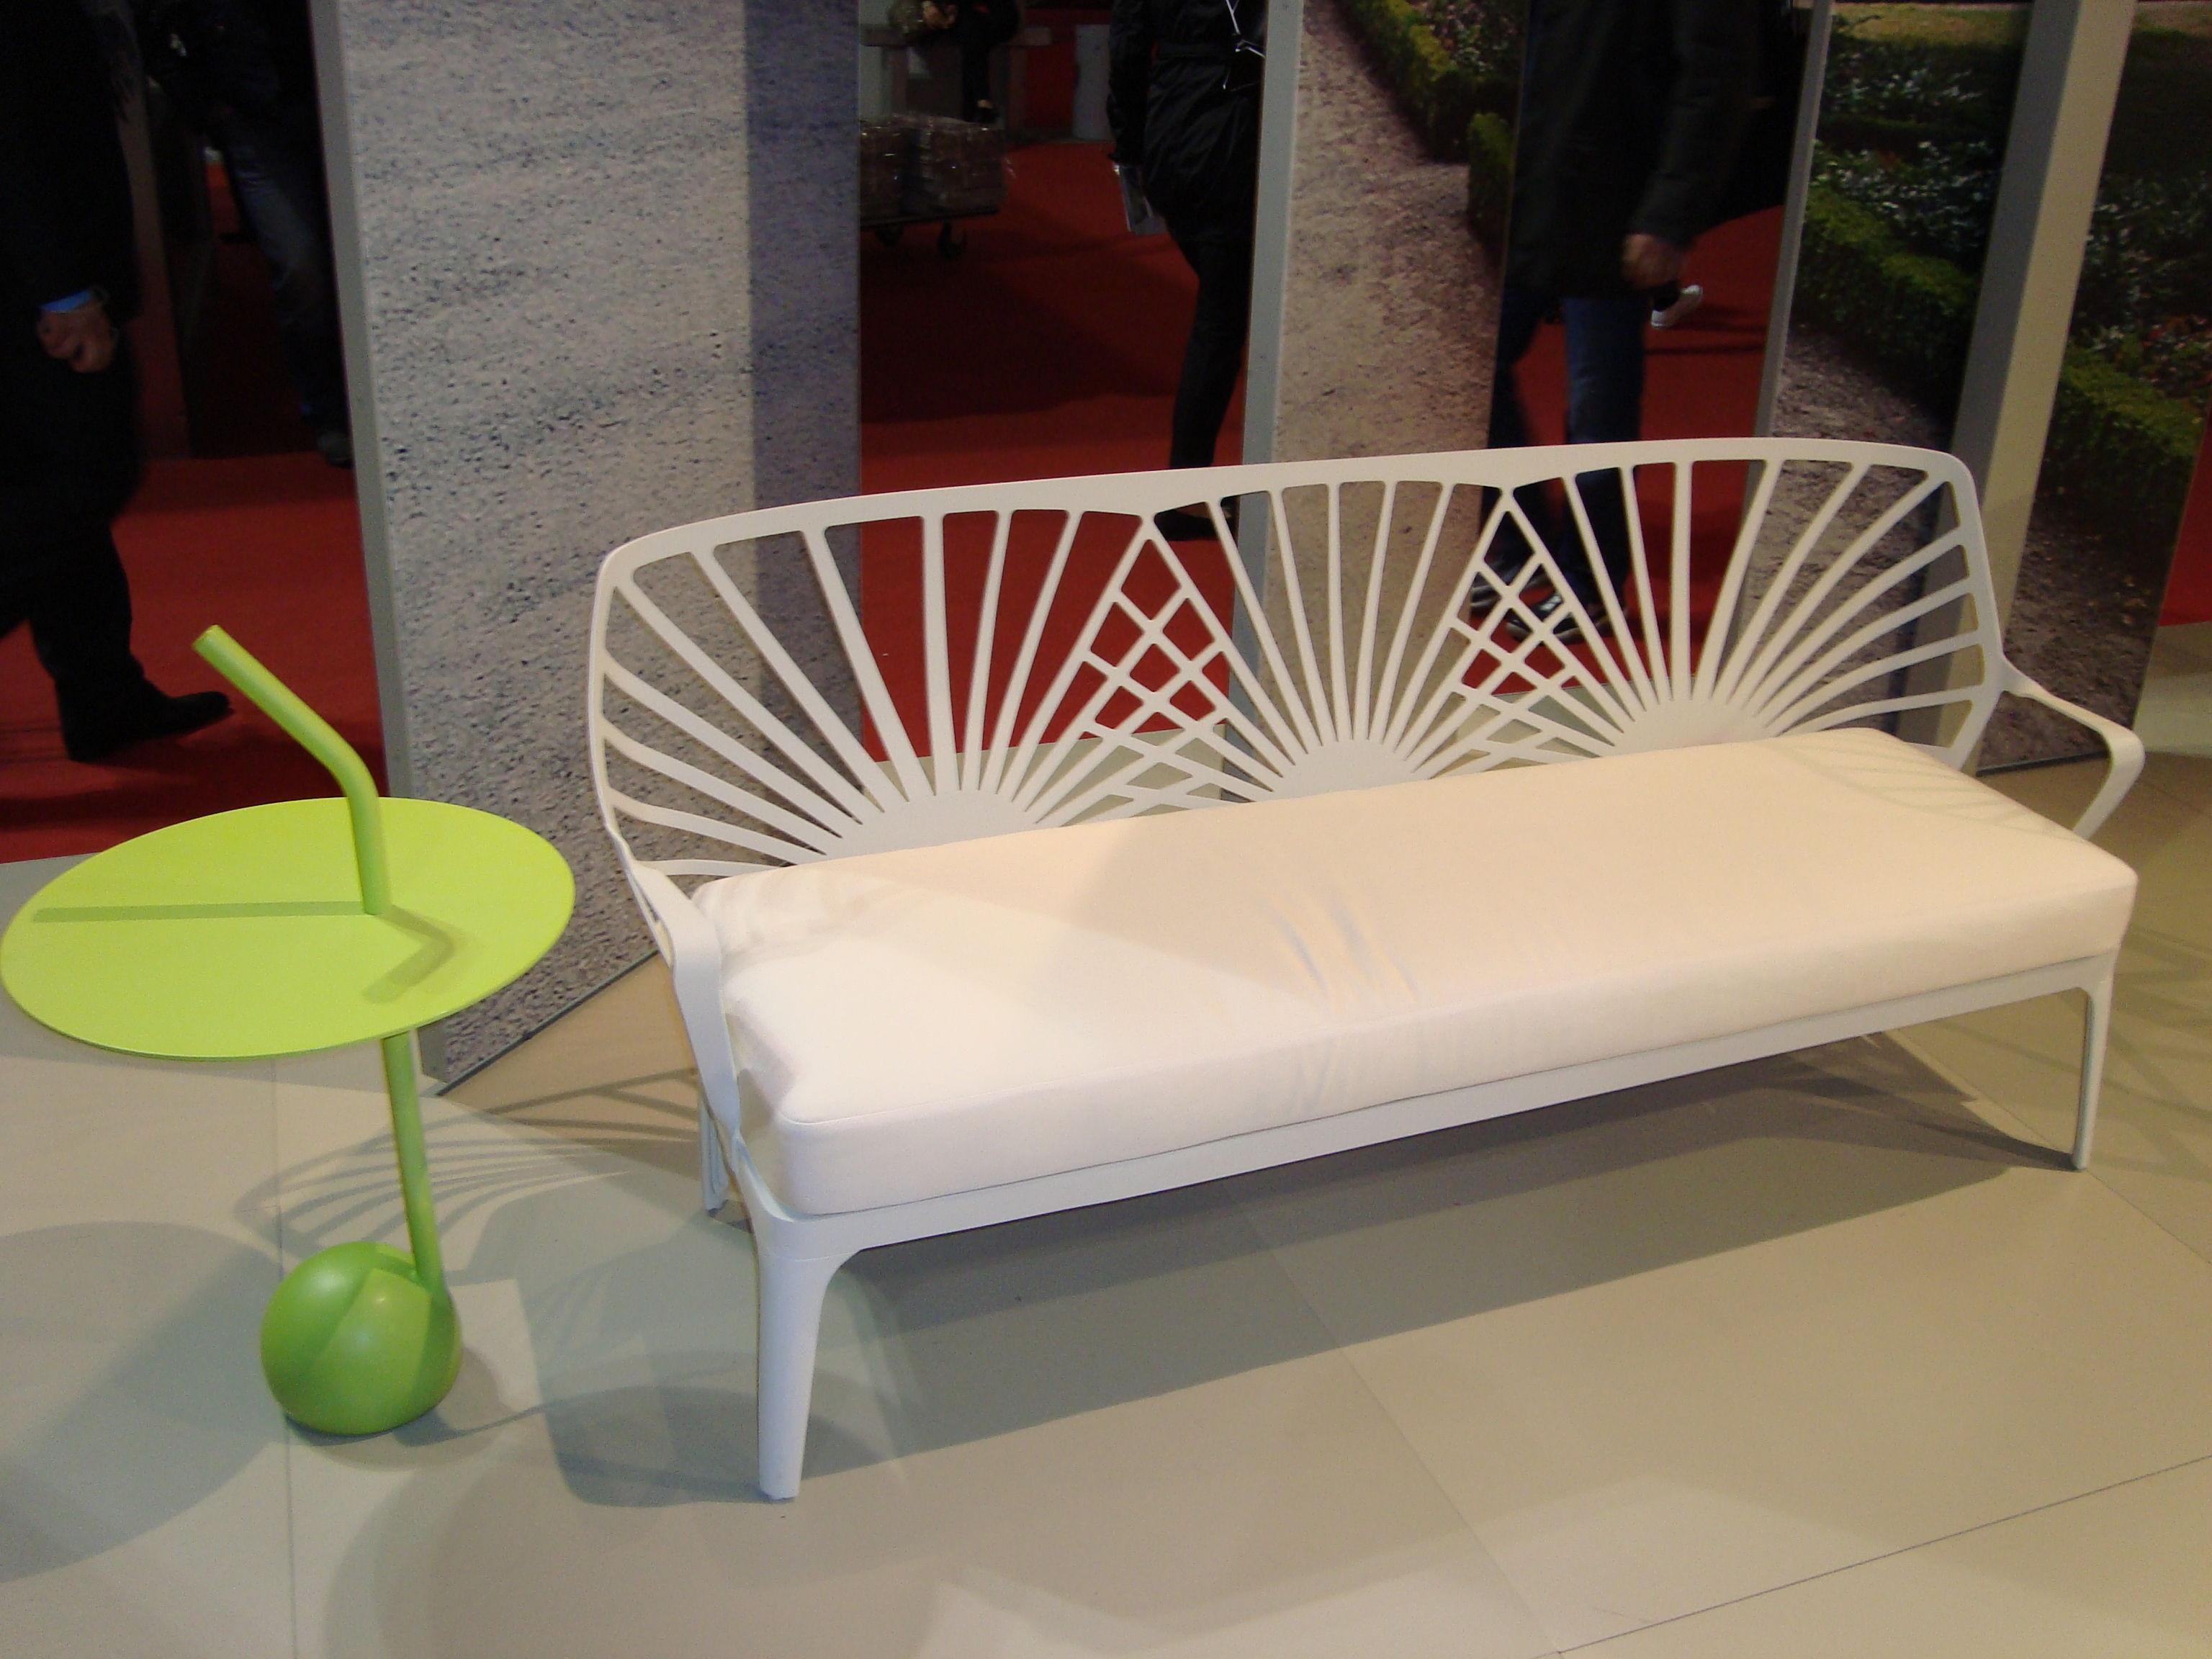 canap droit sunrise l 171 cm blanc driade made in design. Black Bedroom Furniture Sets. Home Design Ideas